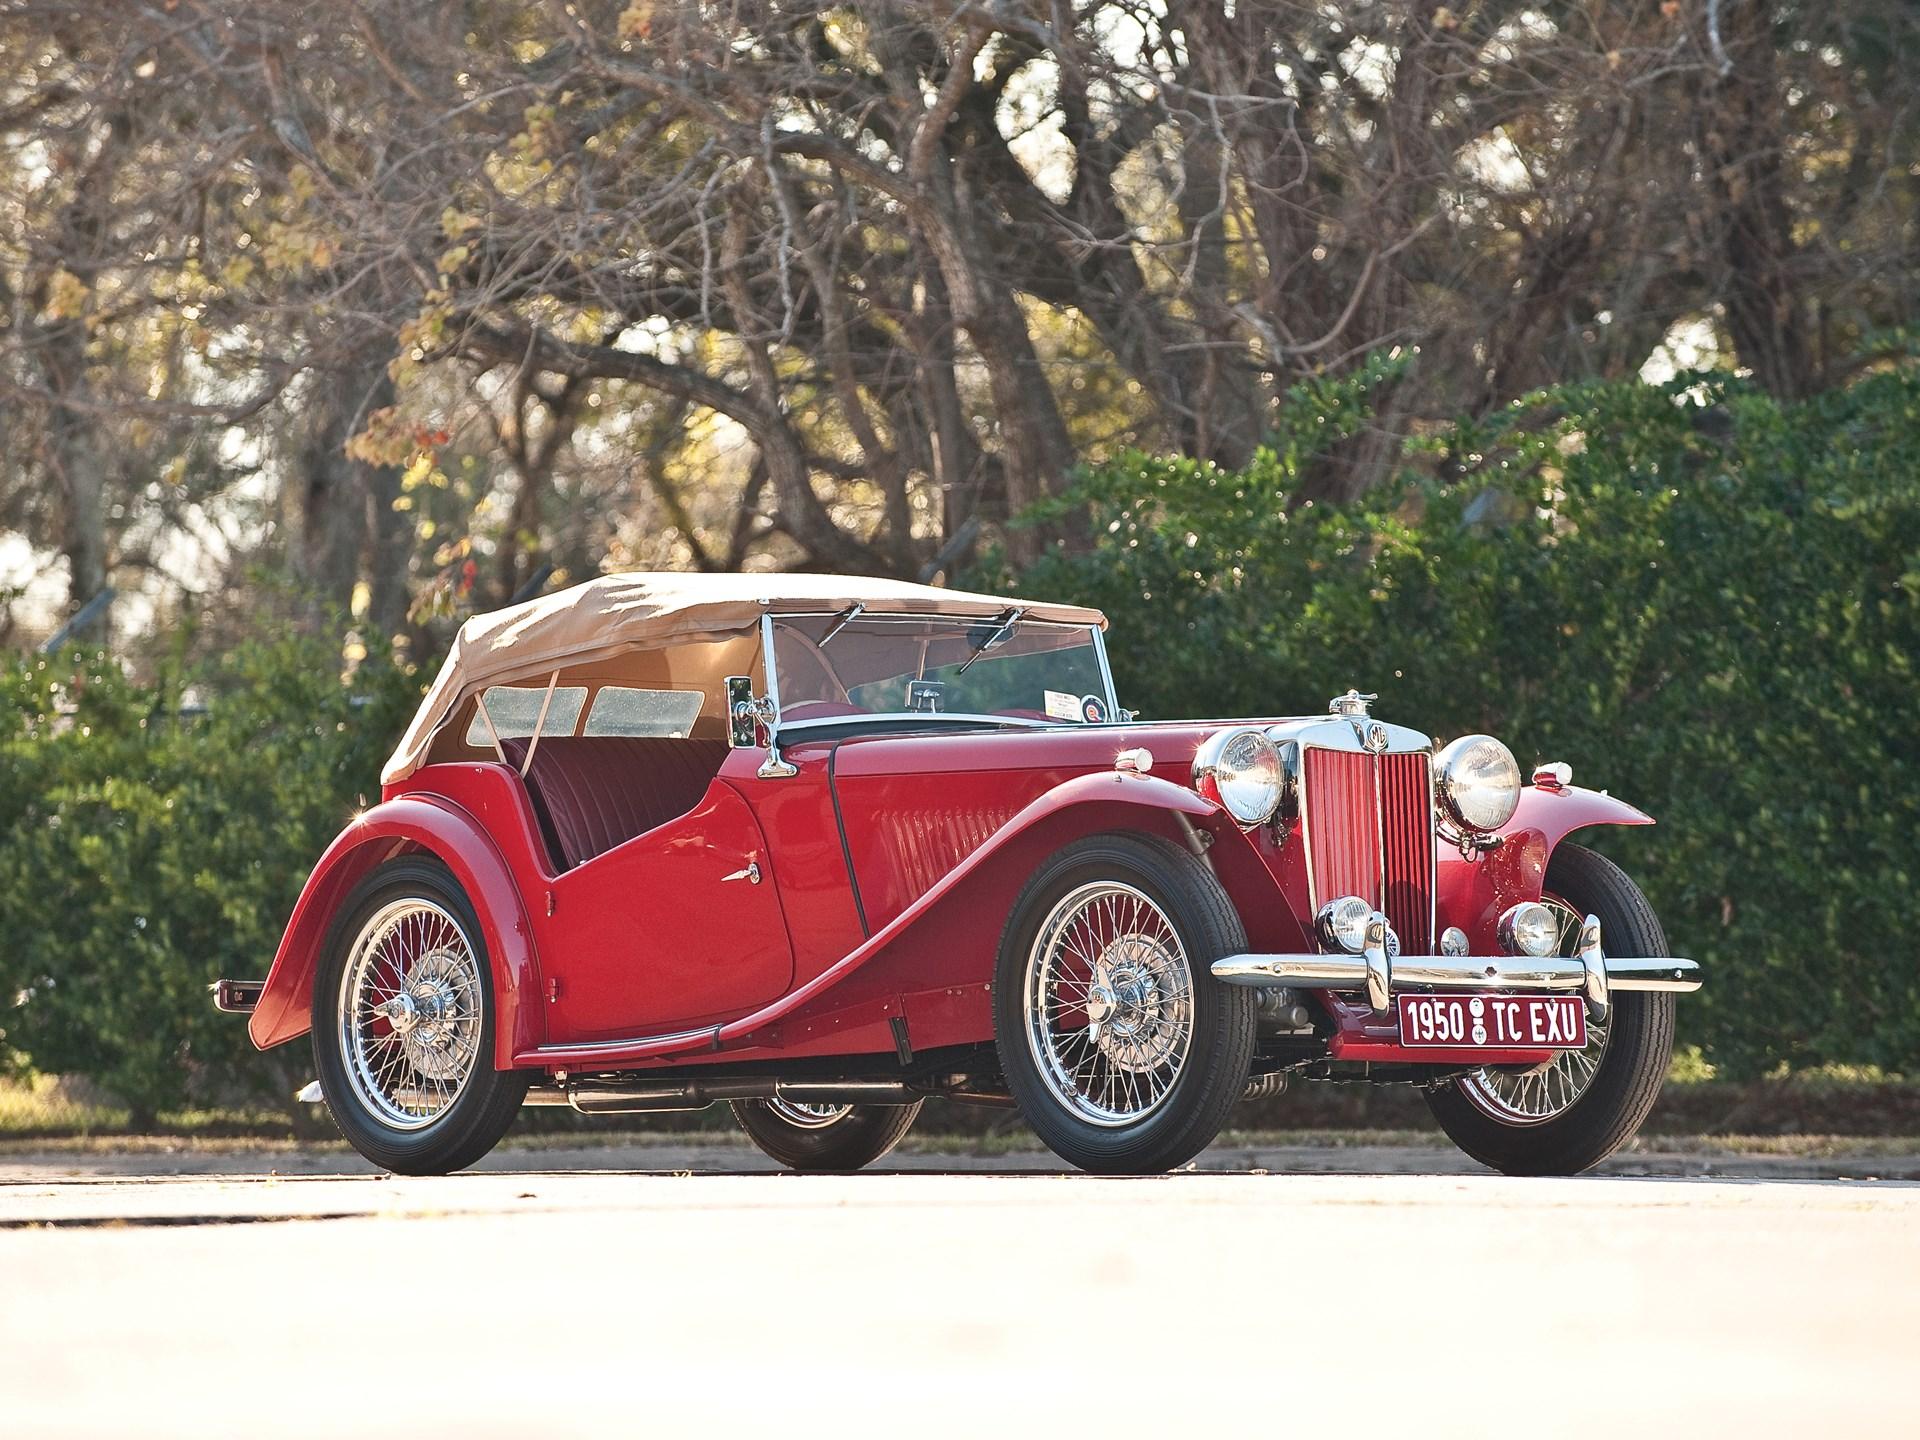 "1950 MG TC SC ""EXU"" Midget Roadster"